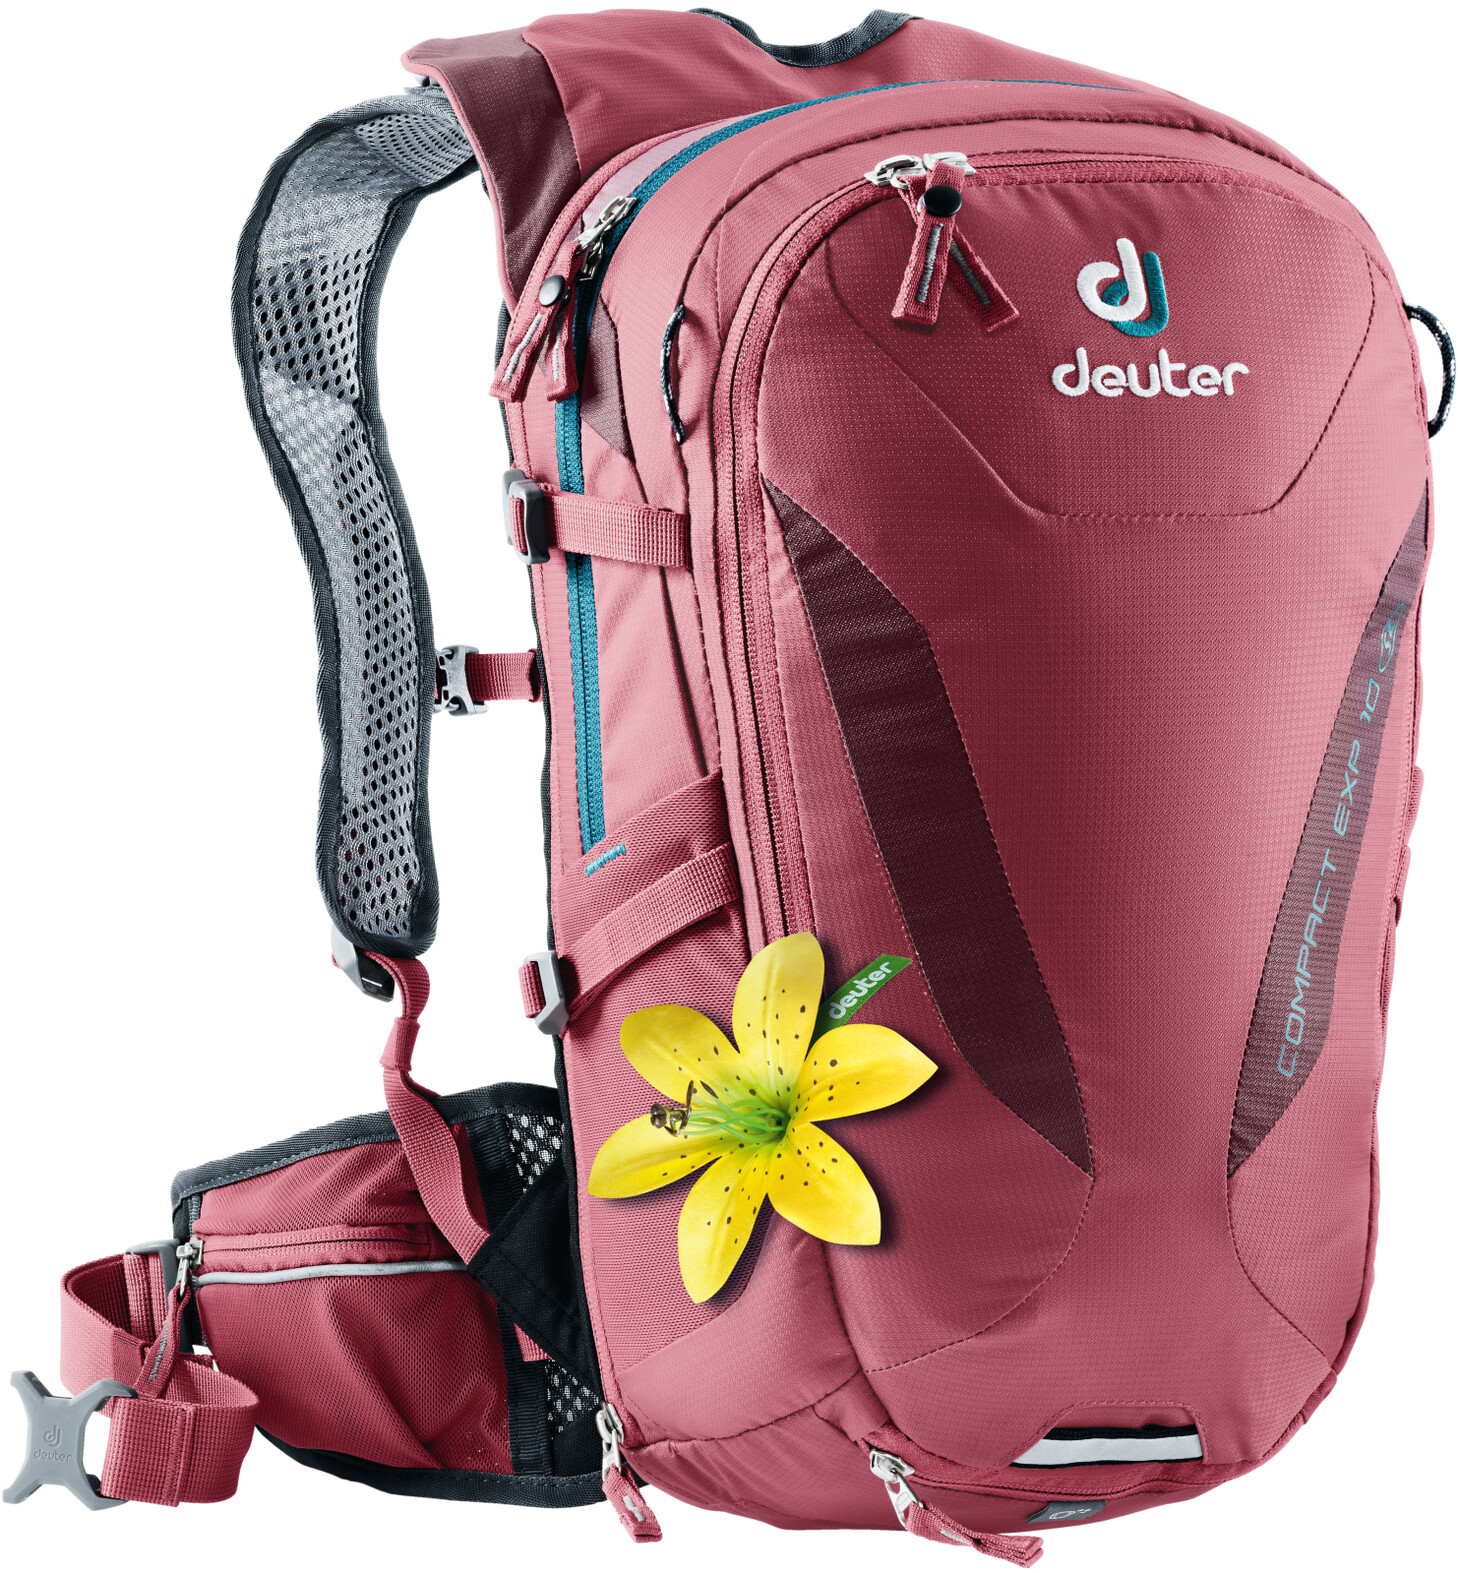 Deuter Compact EXP 10 SL Rygsæk Damer, cardinal-maron (2019)   Travel bags